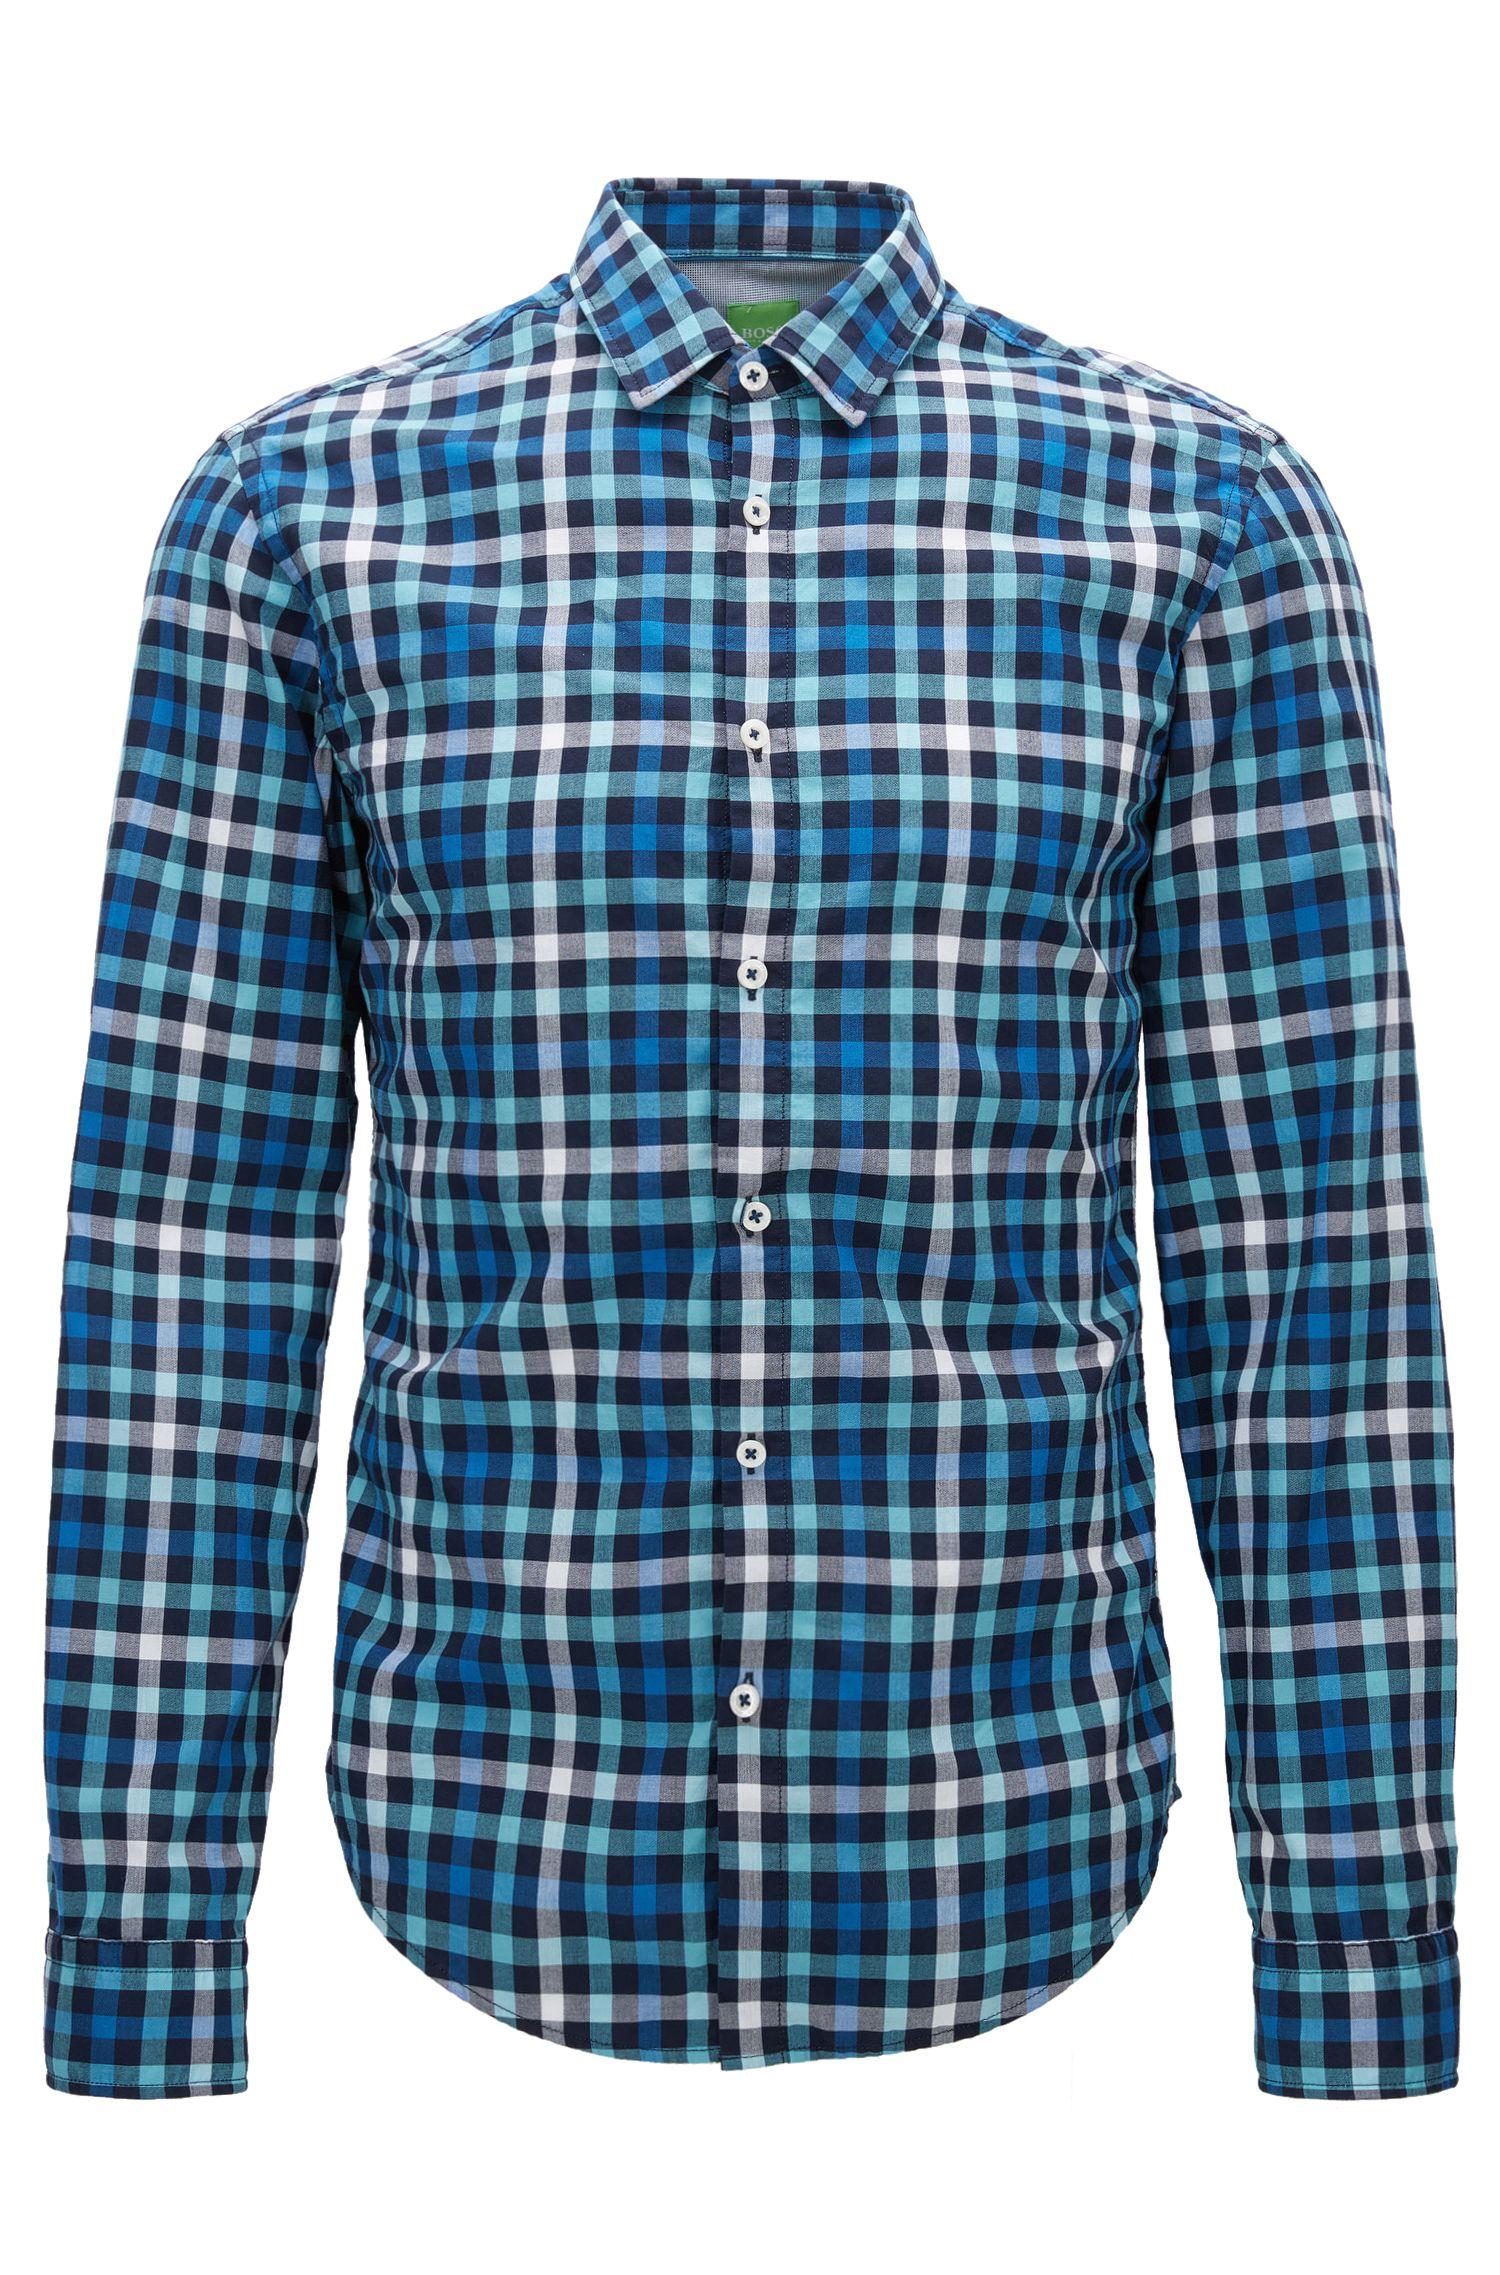 Check Cotton Button Down Shirt, Slim Fit | C-Baldasar S